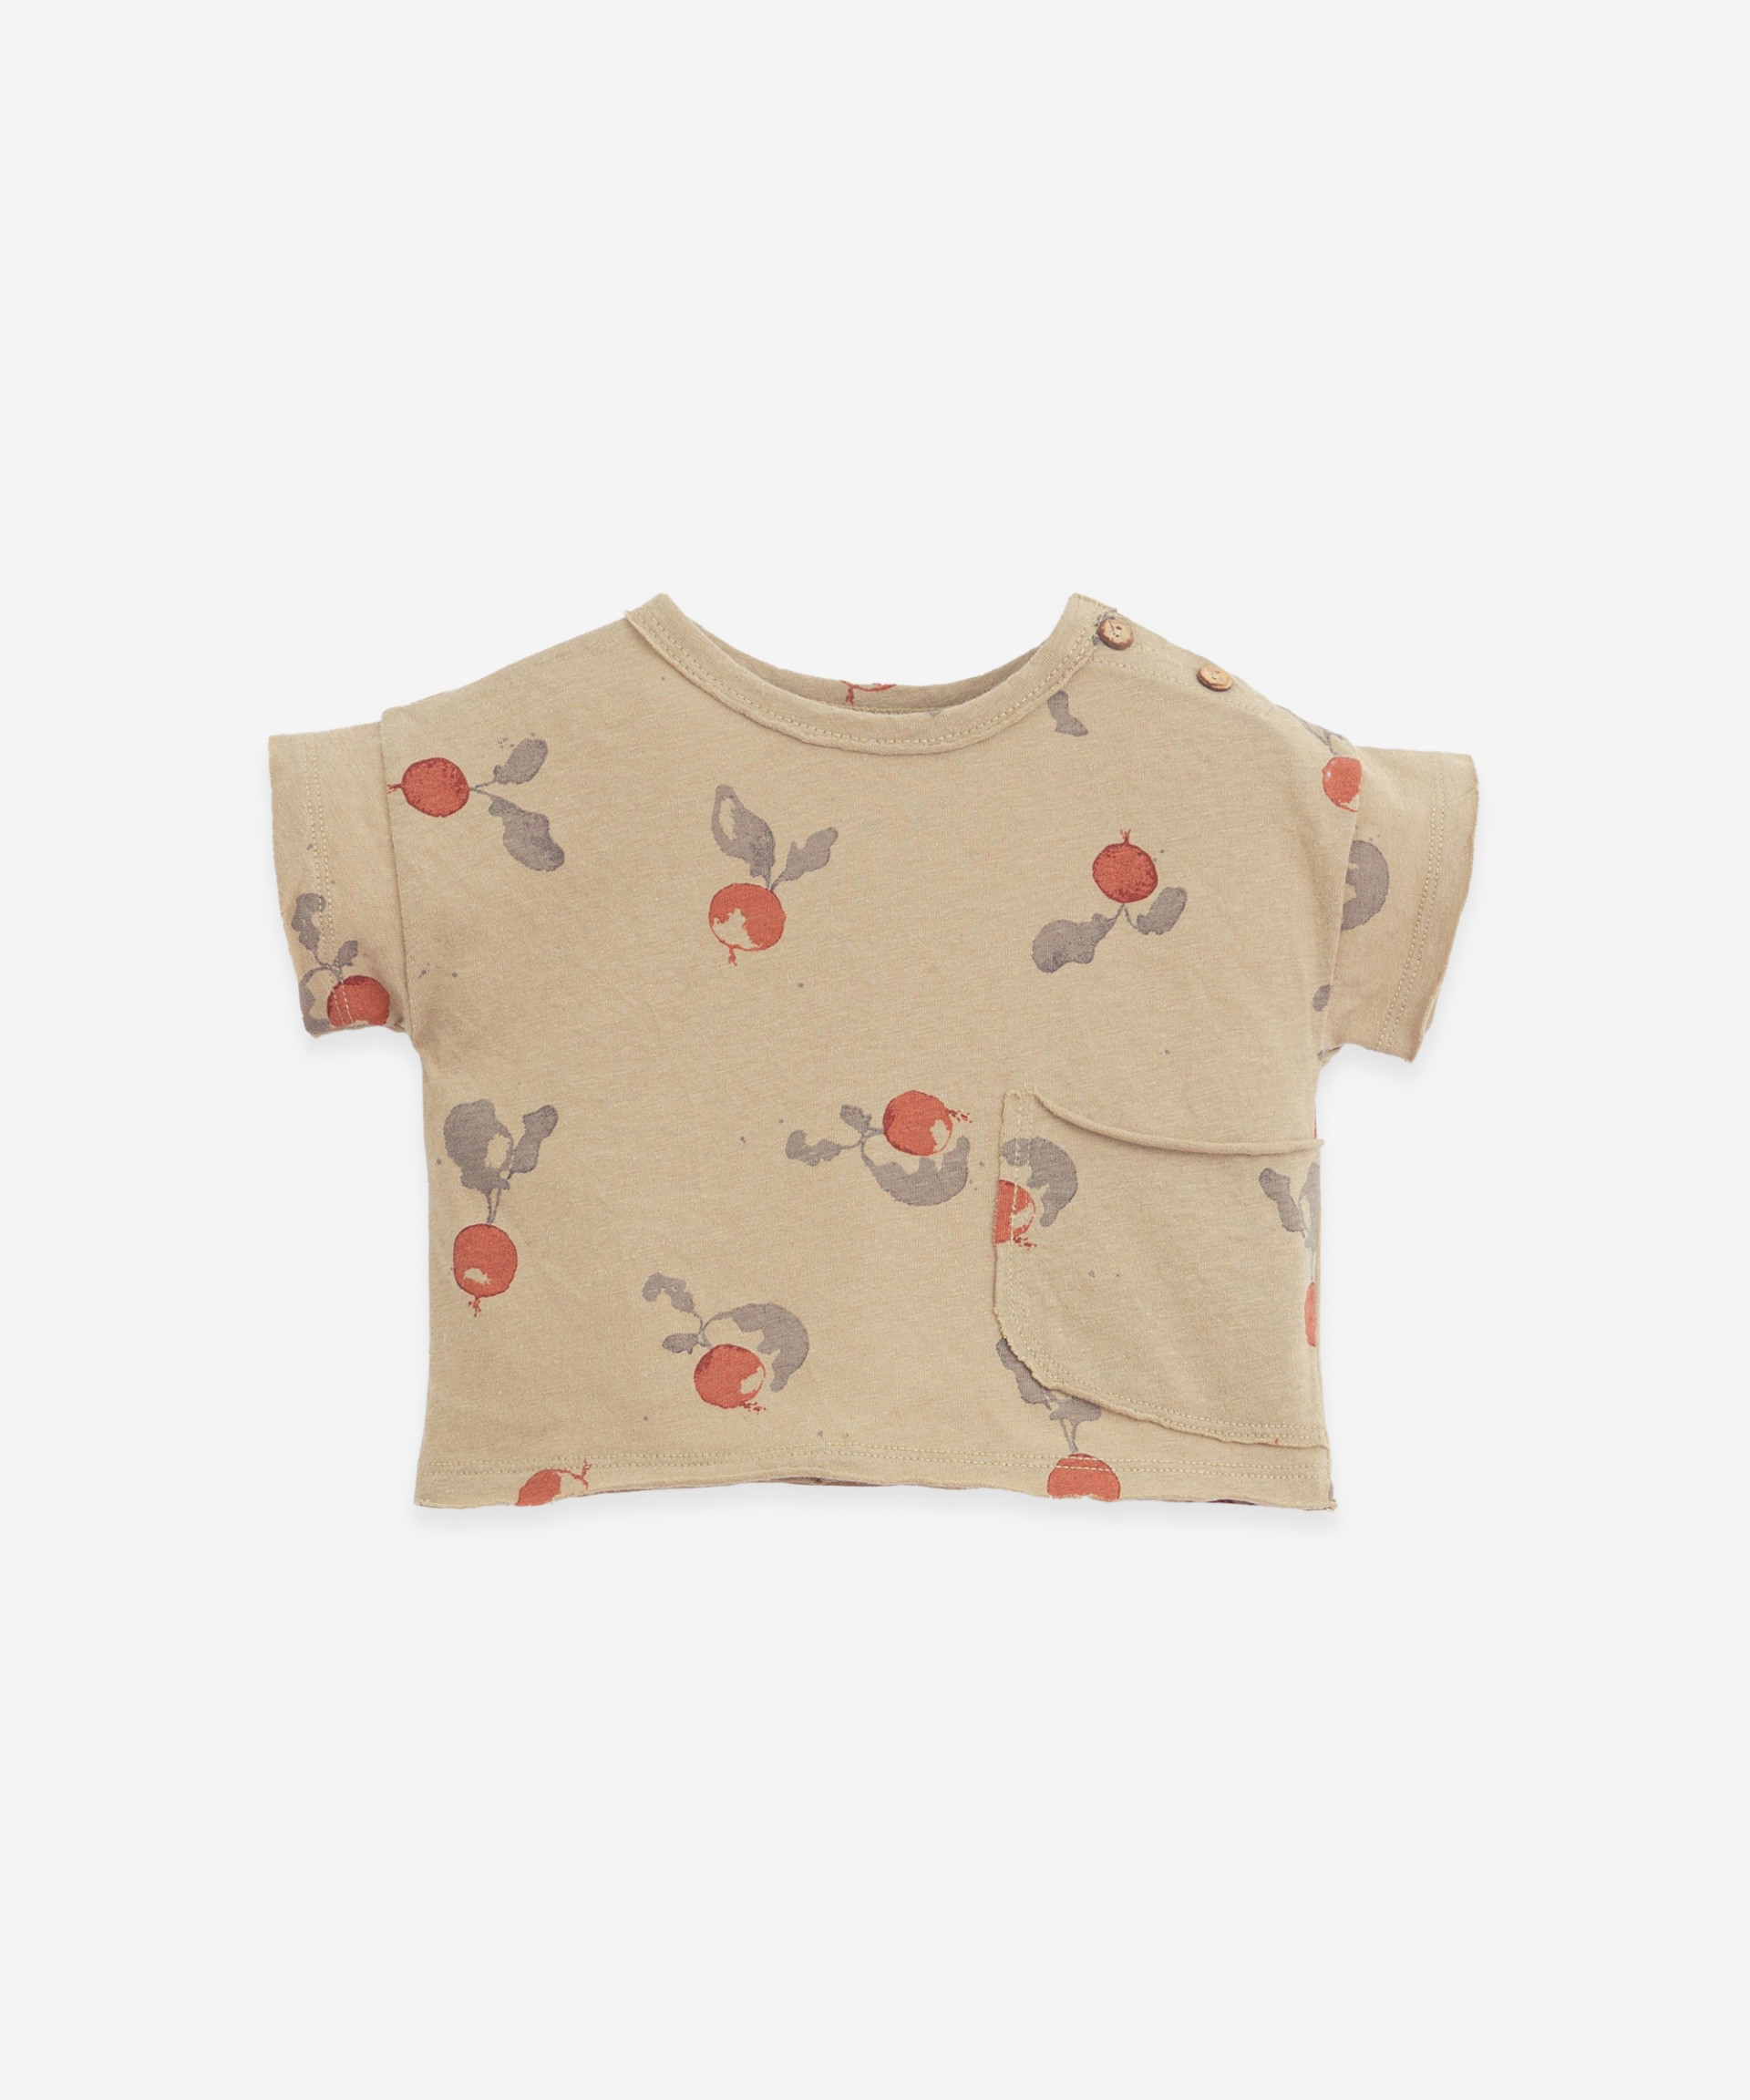 T-shirt con tasca grande | Botany